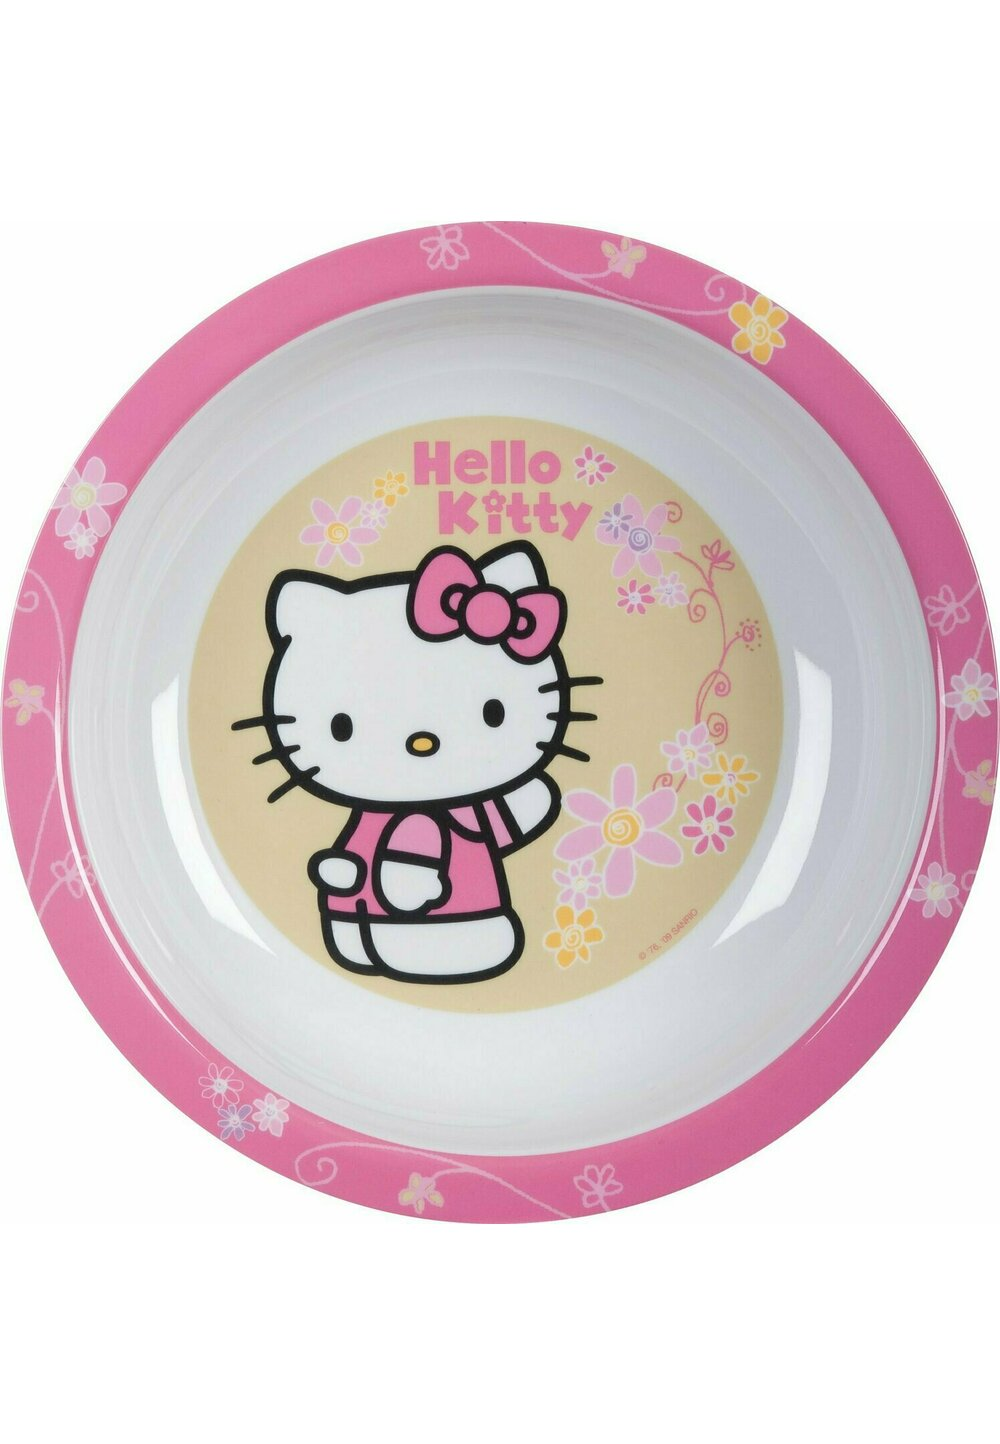 Farfurie adanca, Hello Kitty, roz imagine